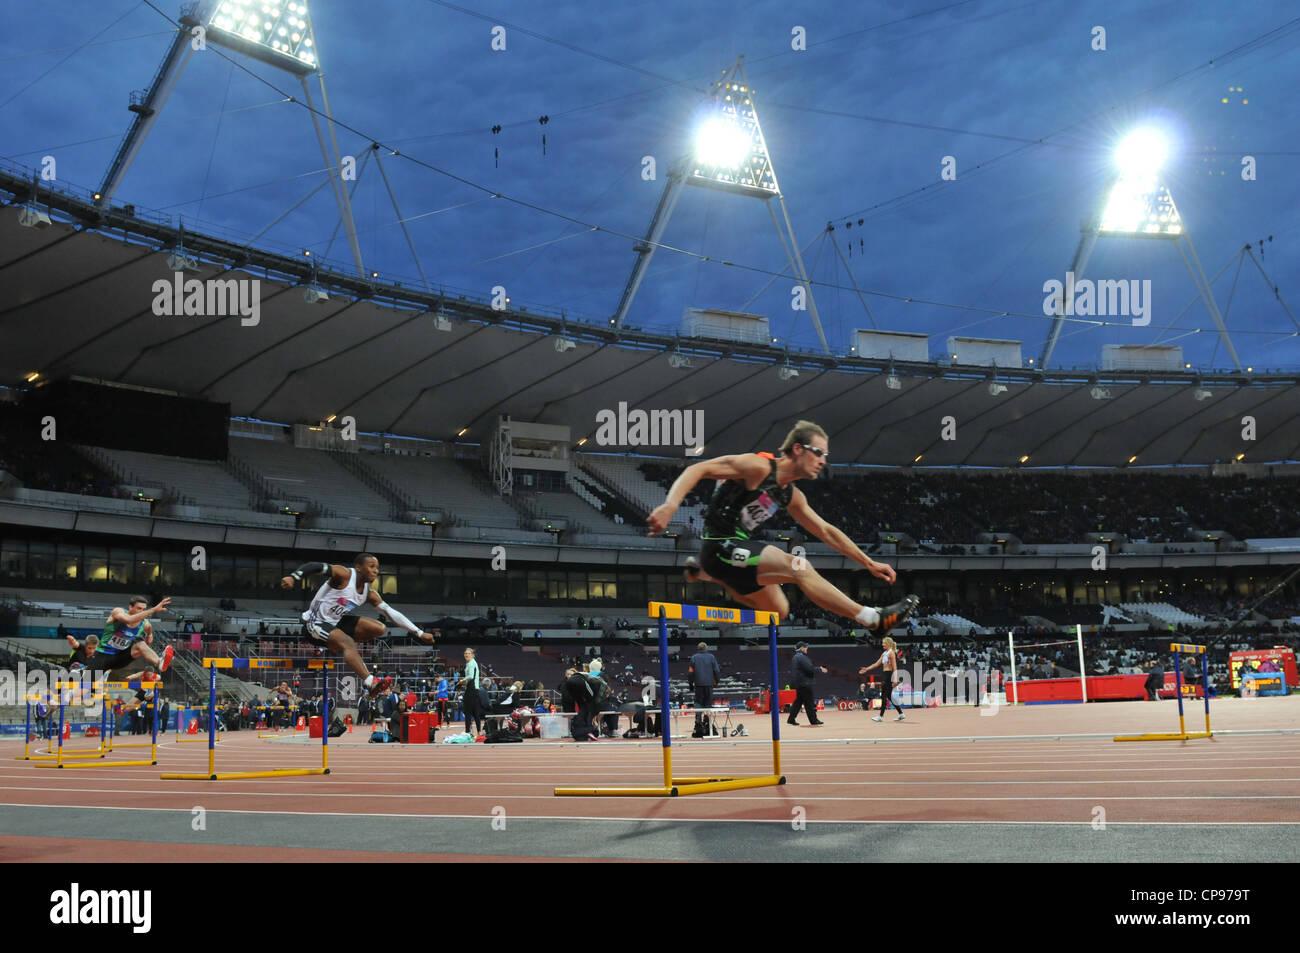 Olympic 2012 Athletics Stadium, Londra, Regno Unito. Uomini 400m ostacoli al BUCS VISA Outdoor Athletics Championships. Immagini Stock